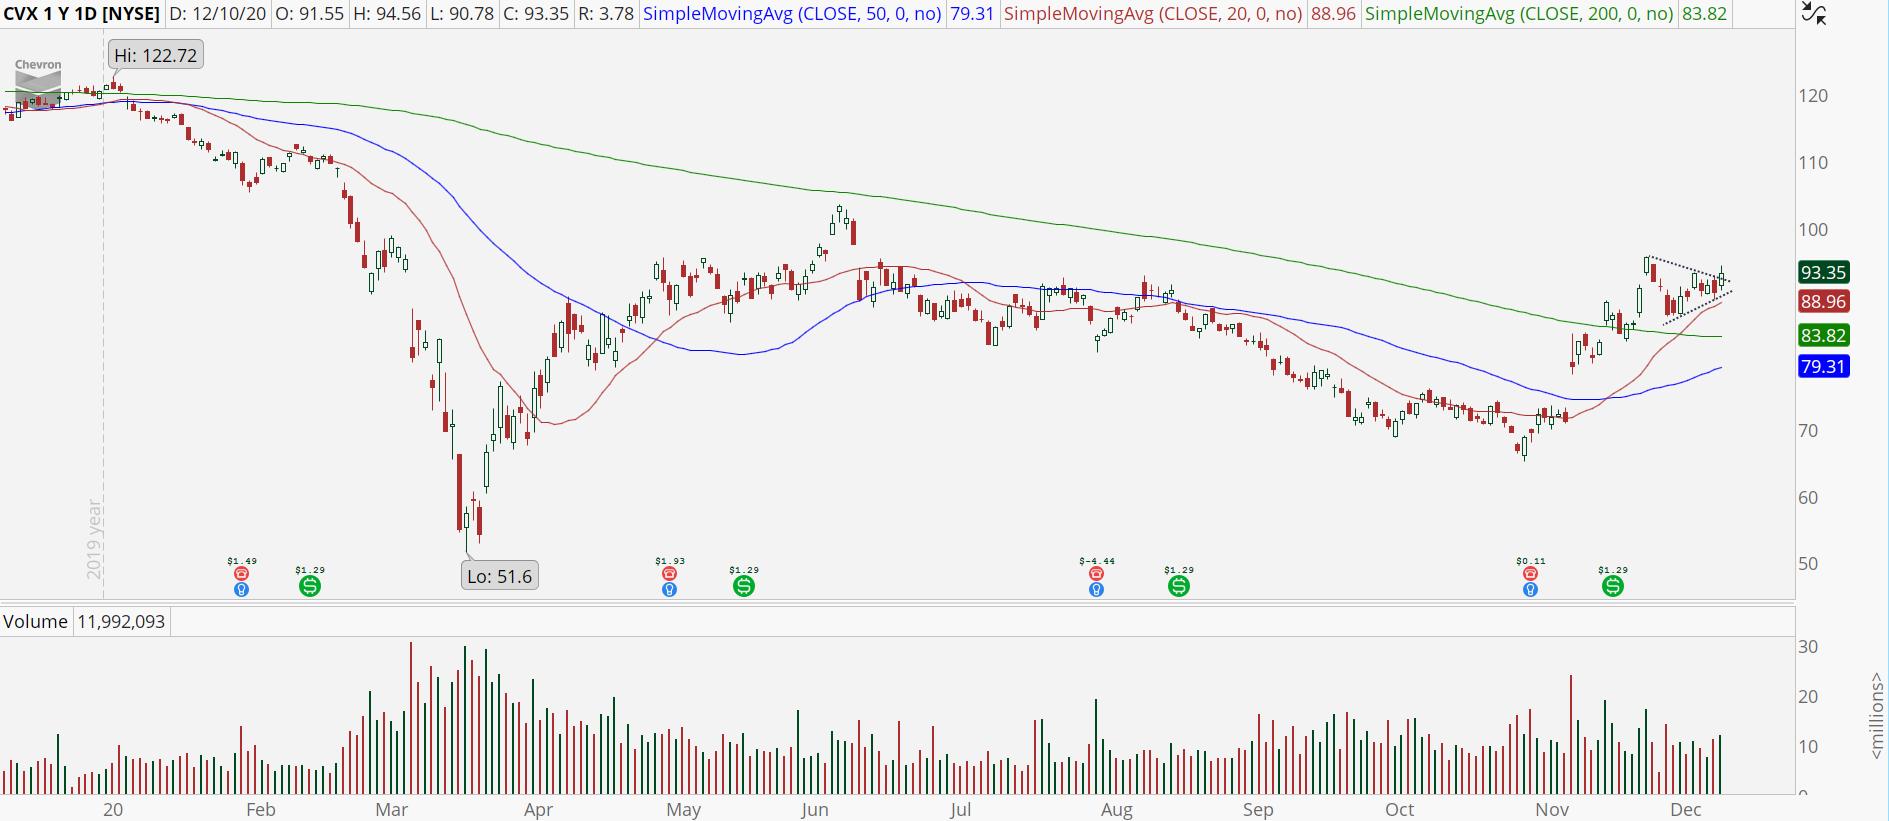 Chevron (CVX) stock with symmetrical triangle